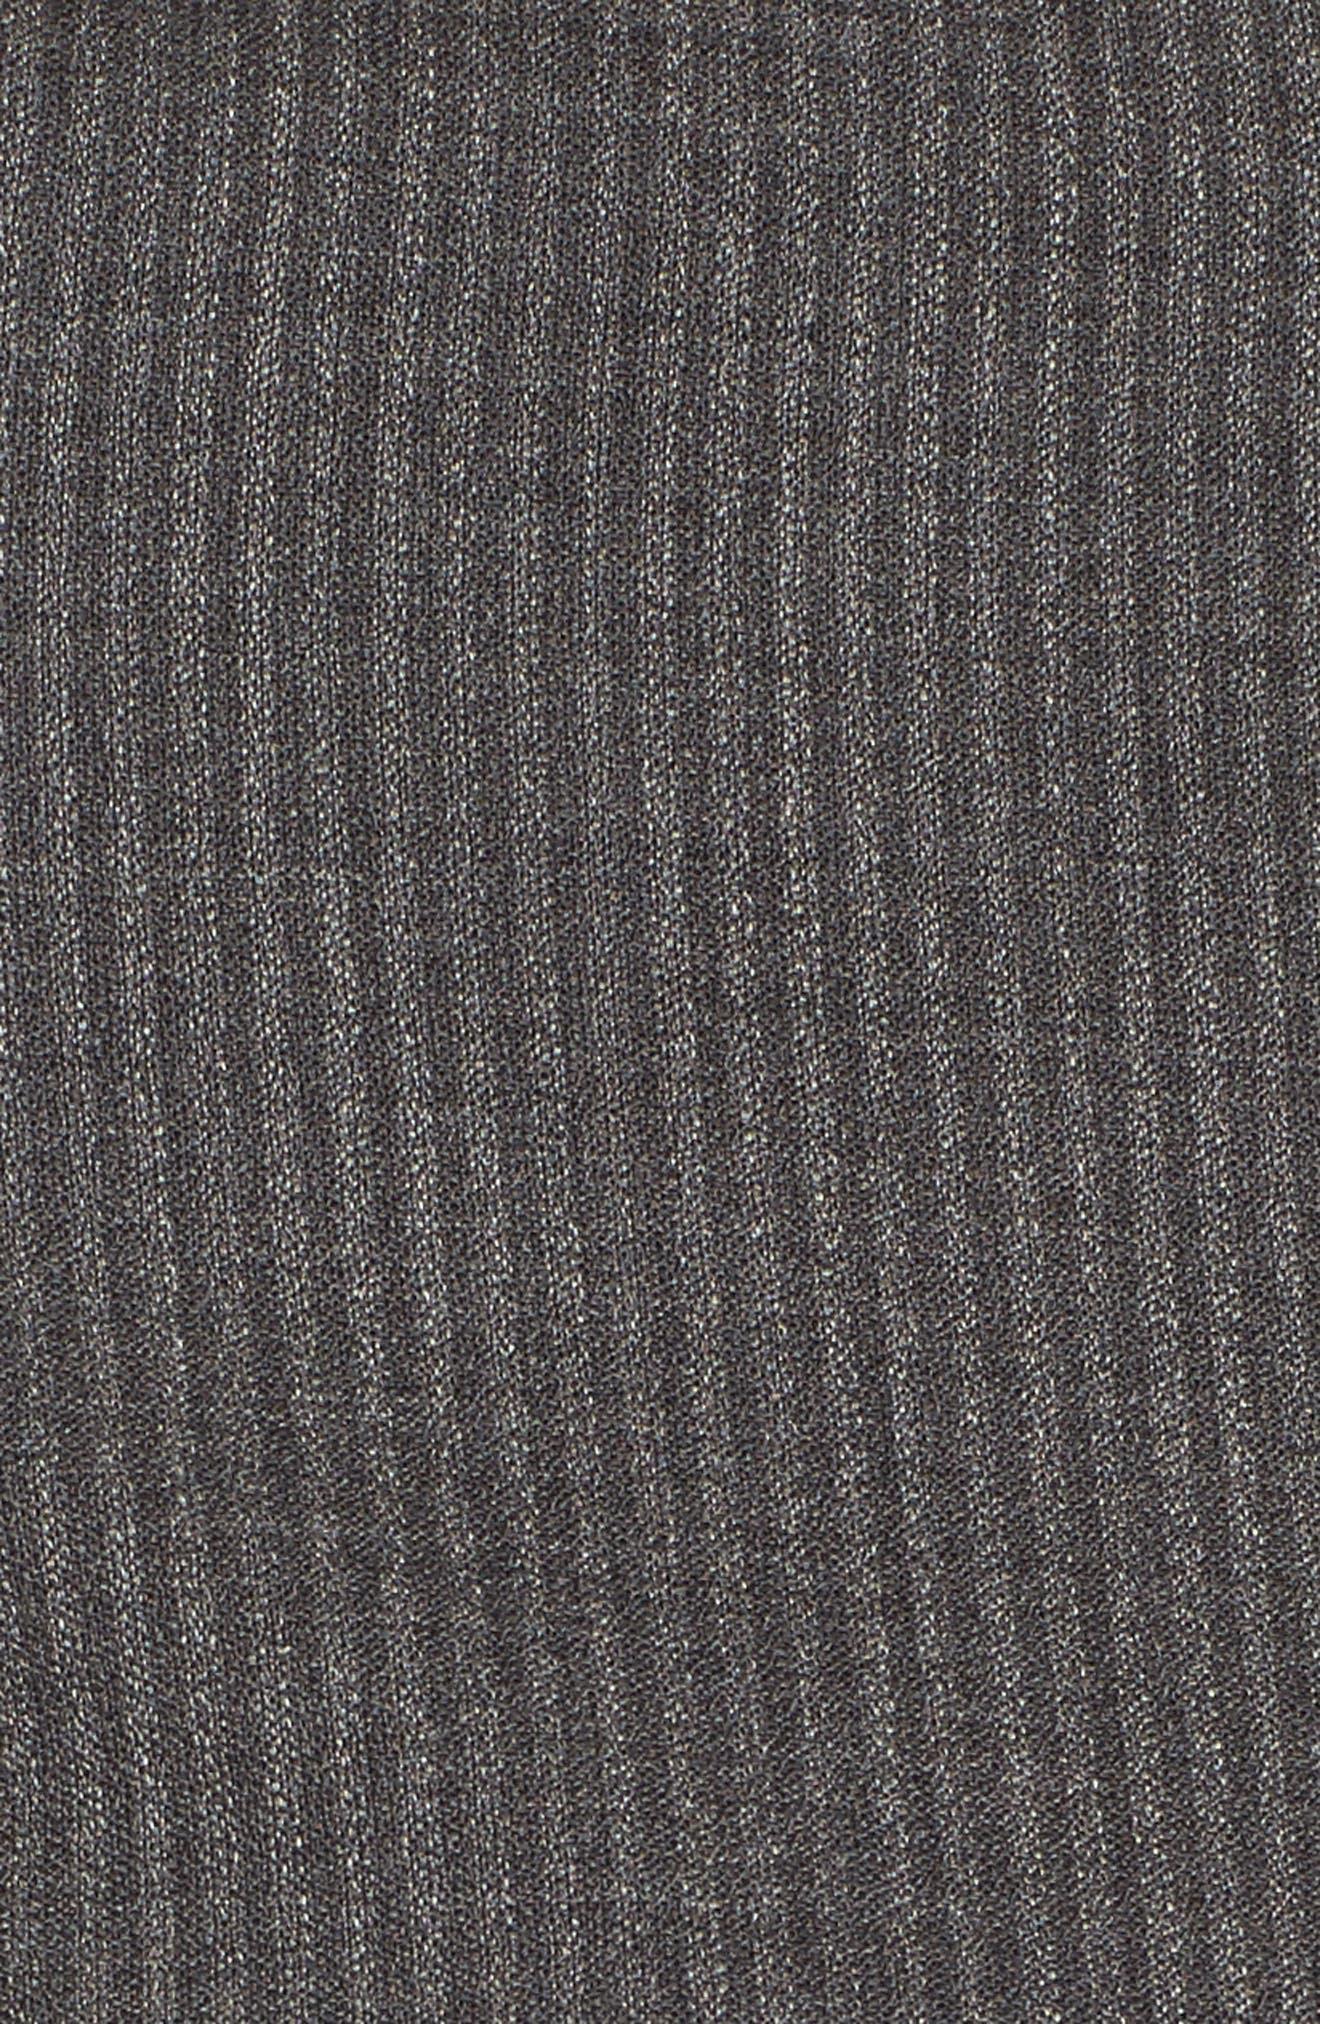 Jasyma Stripe Wool Suit Jacket,                             Alternate thumbnail 5, color,                             Dark Grey Fantasy